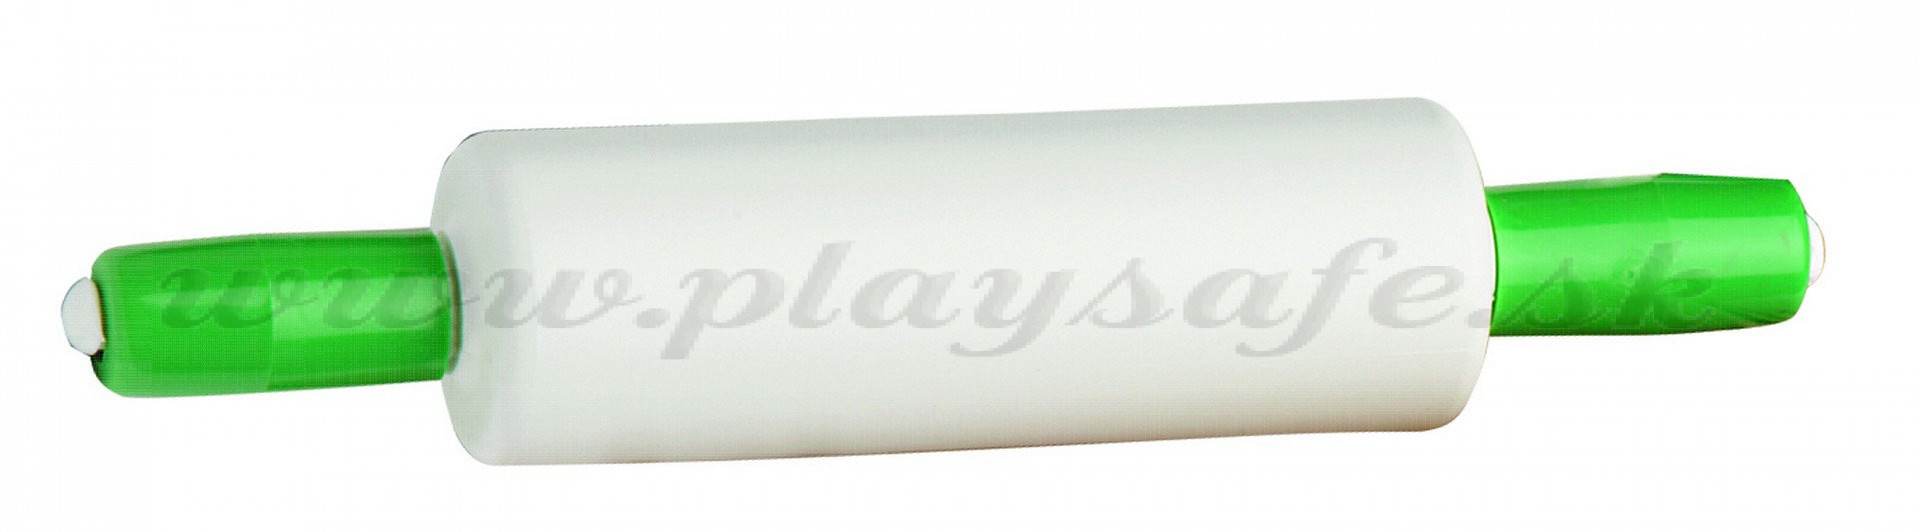 JOVI® Modelling Roller, 1 piece